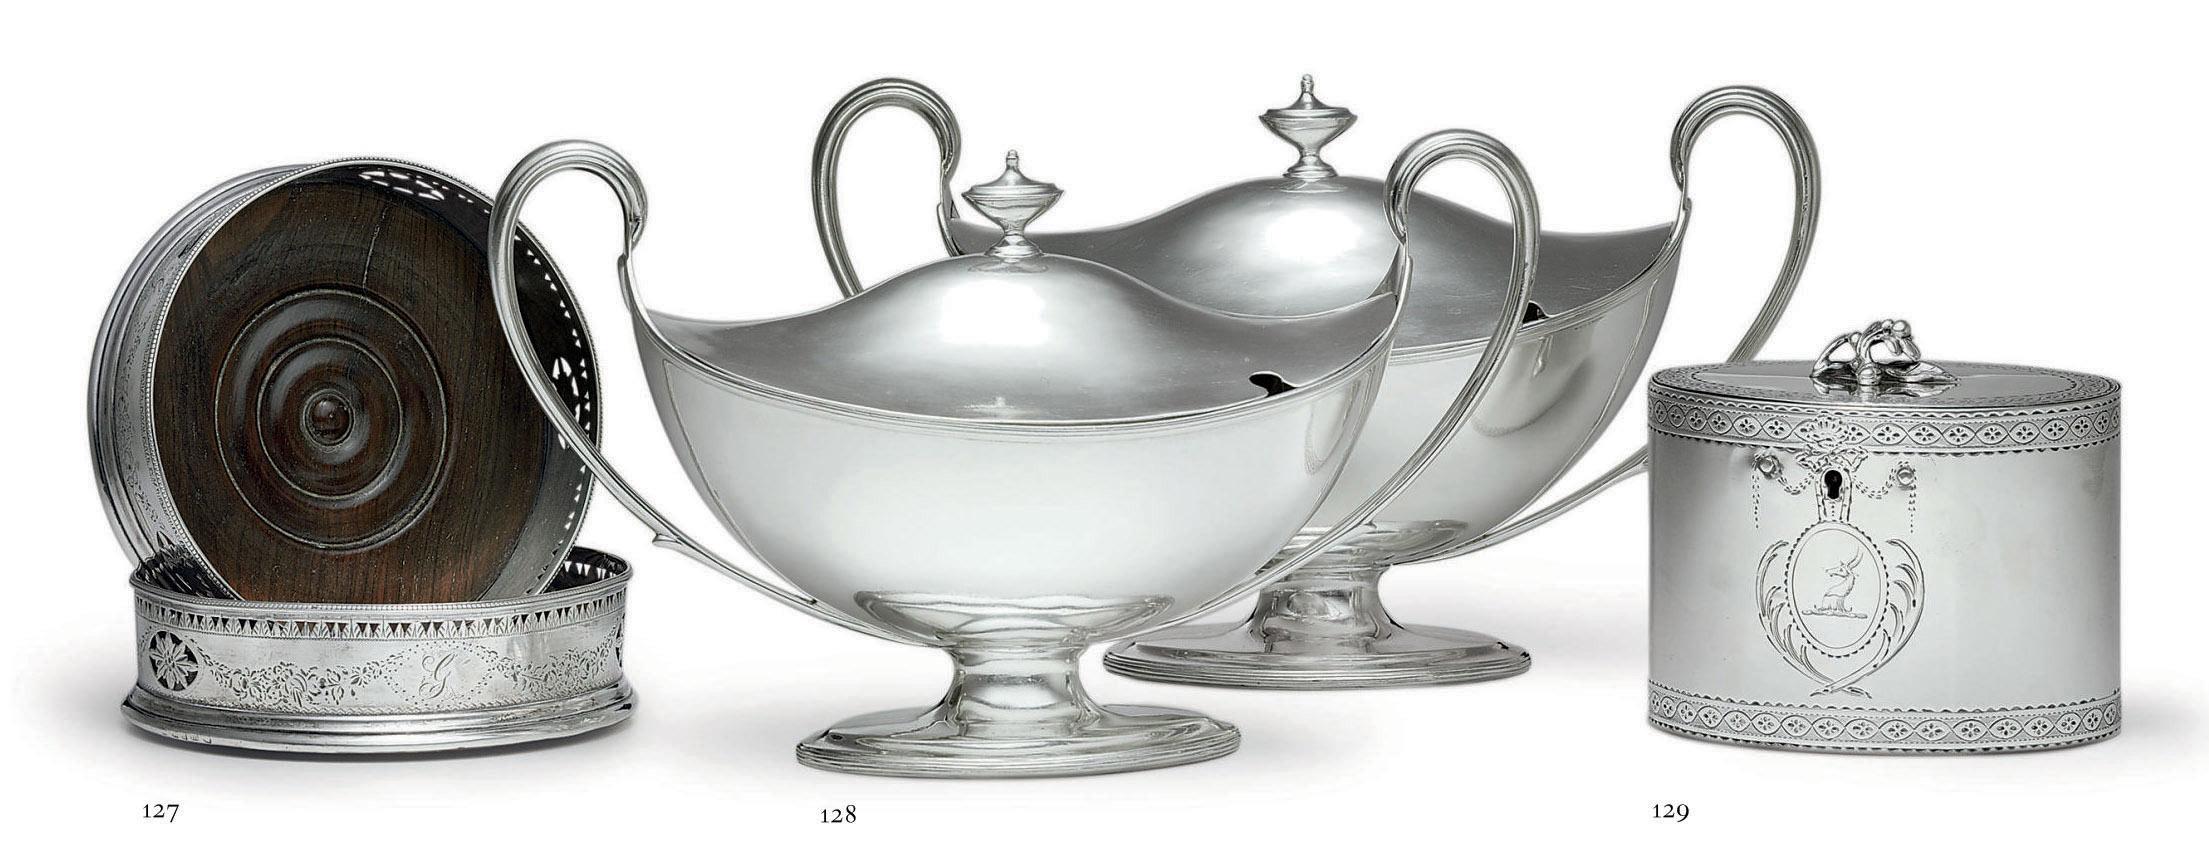 A GEORGE III SILVER TEA CADDY